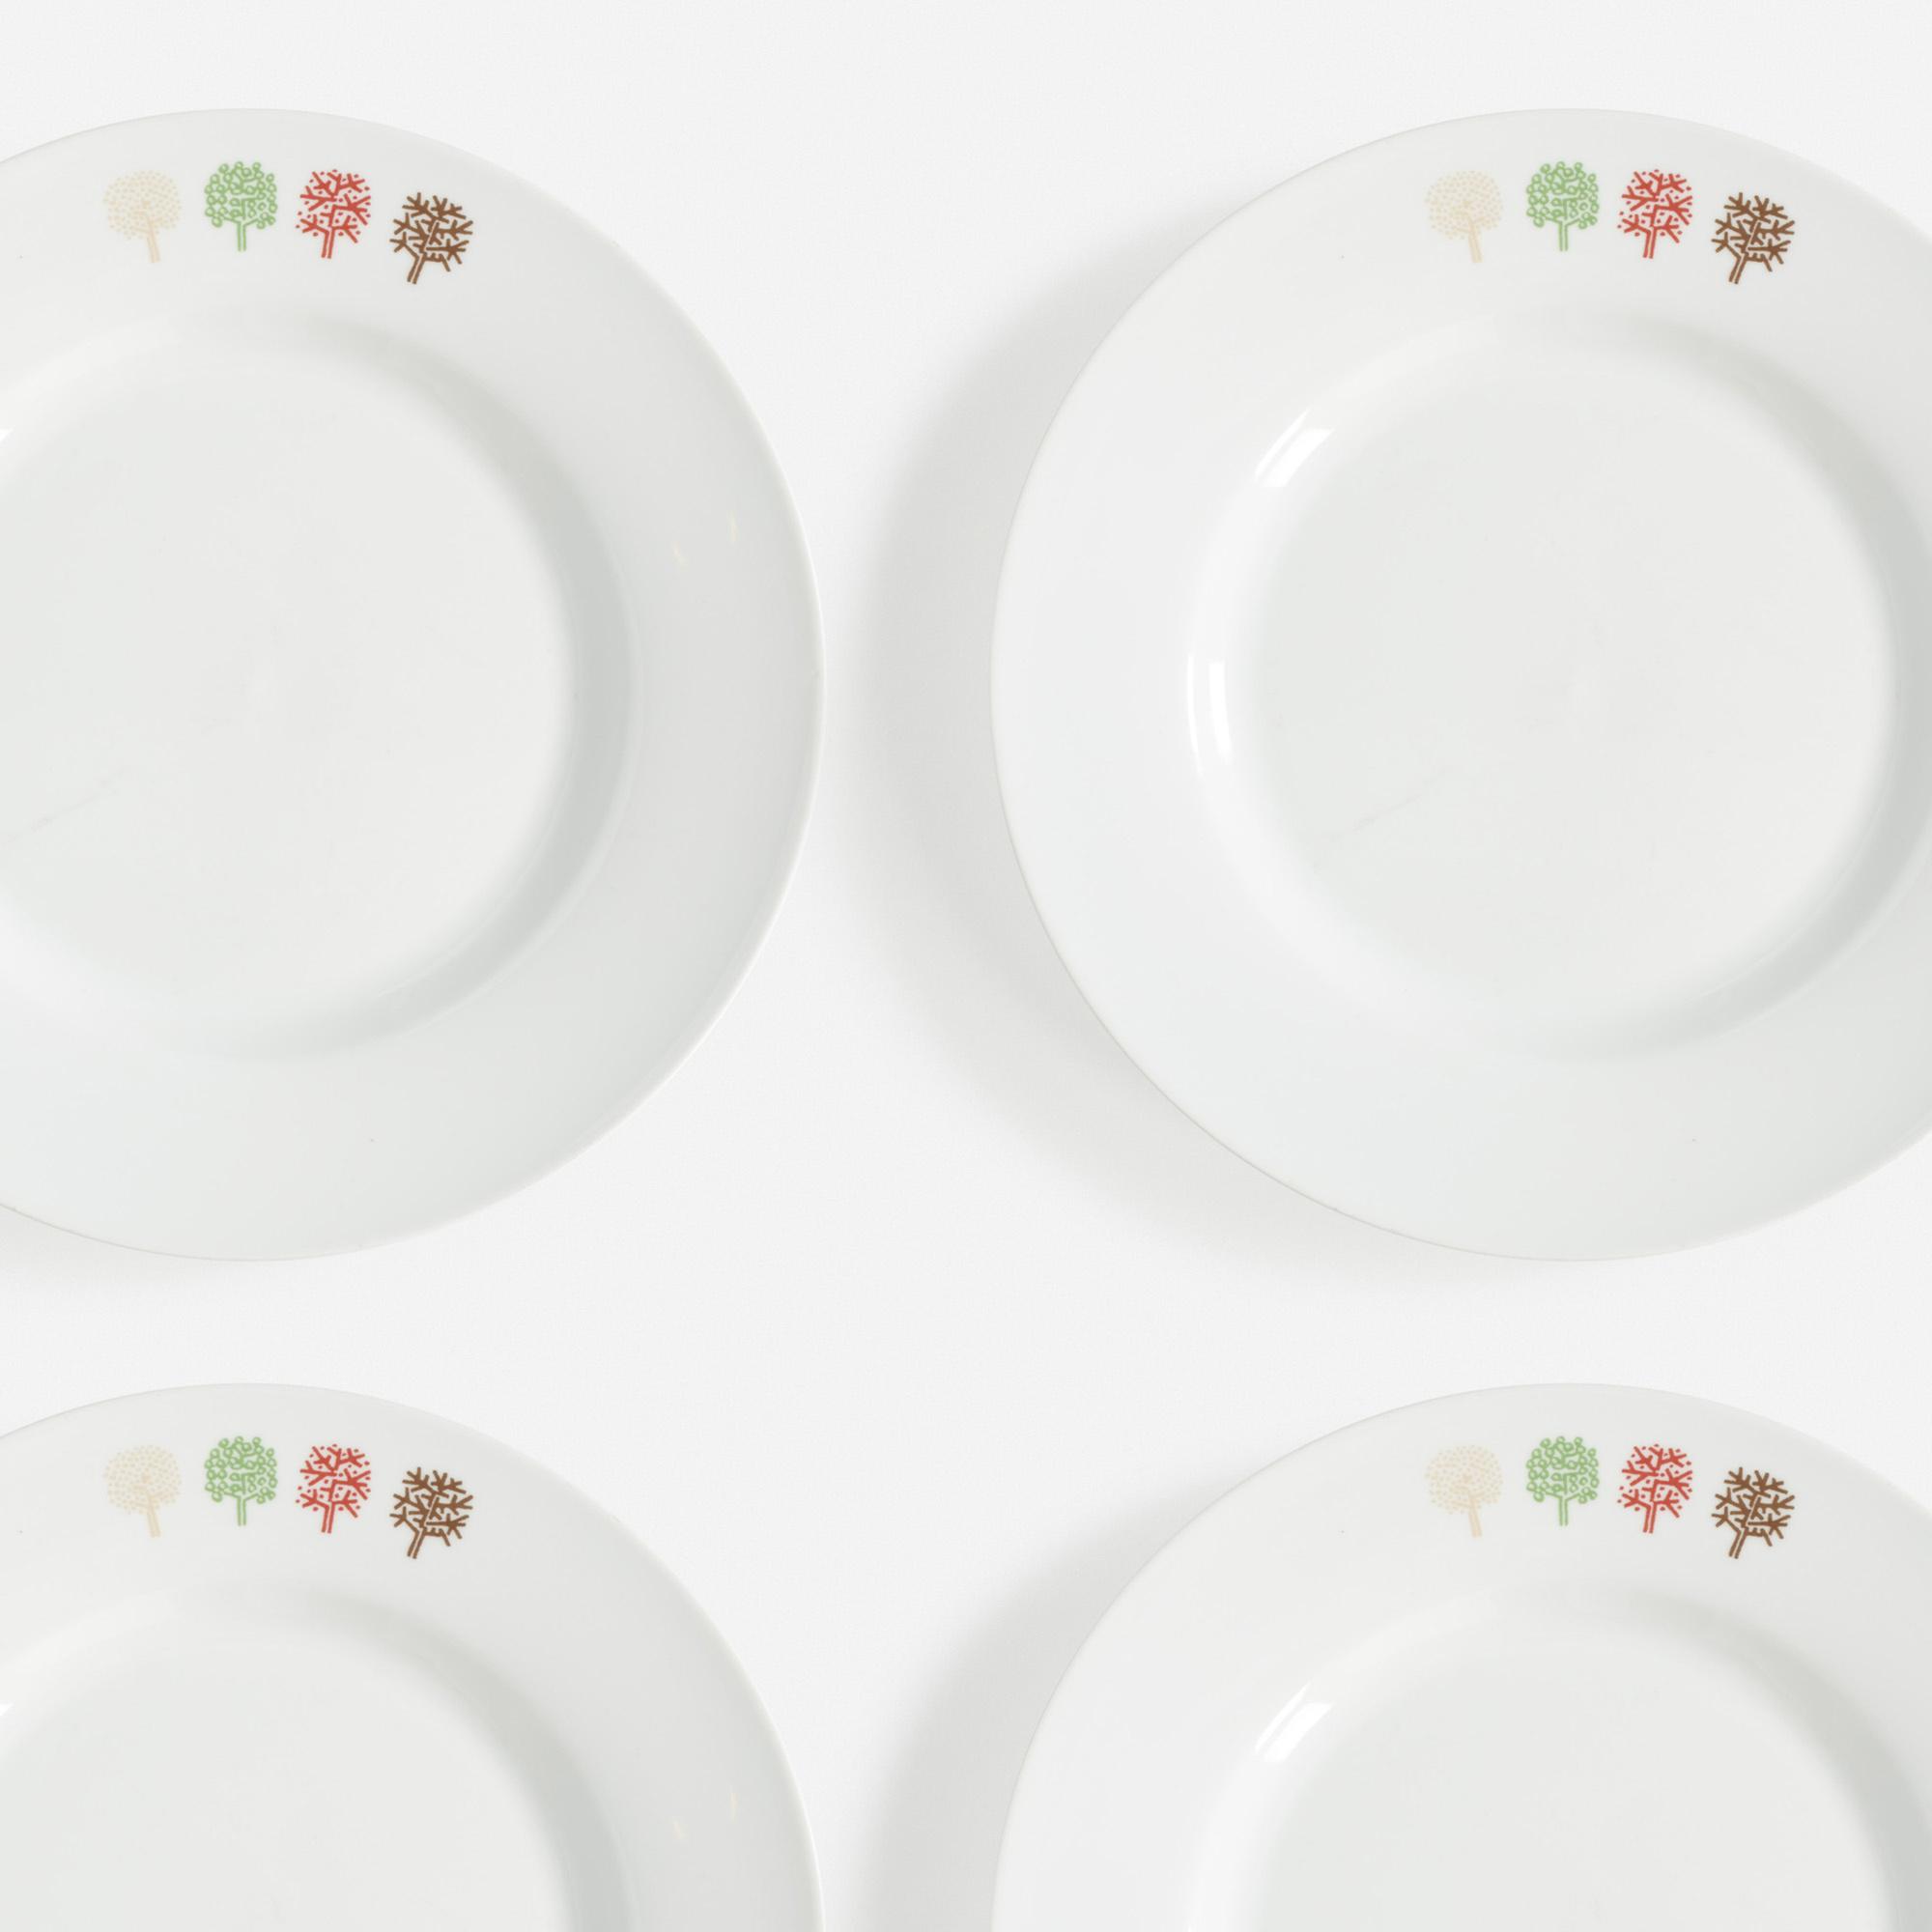 440:  / Four Seasons plates, set of twelve (1 of 1)